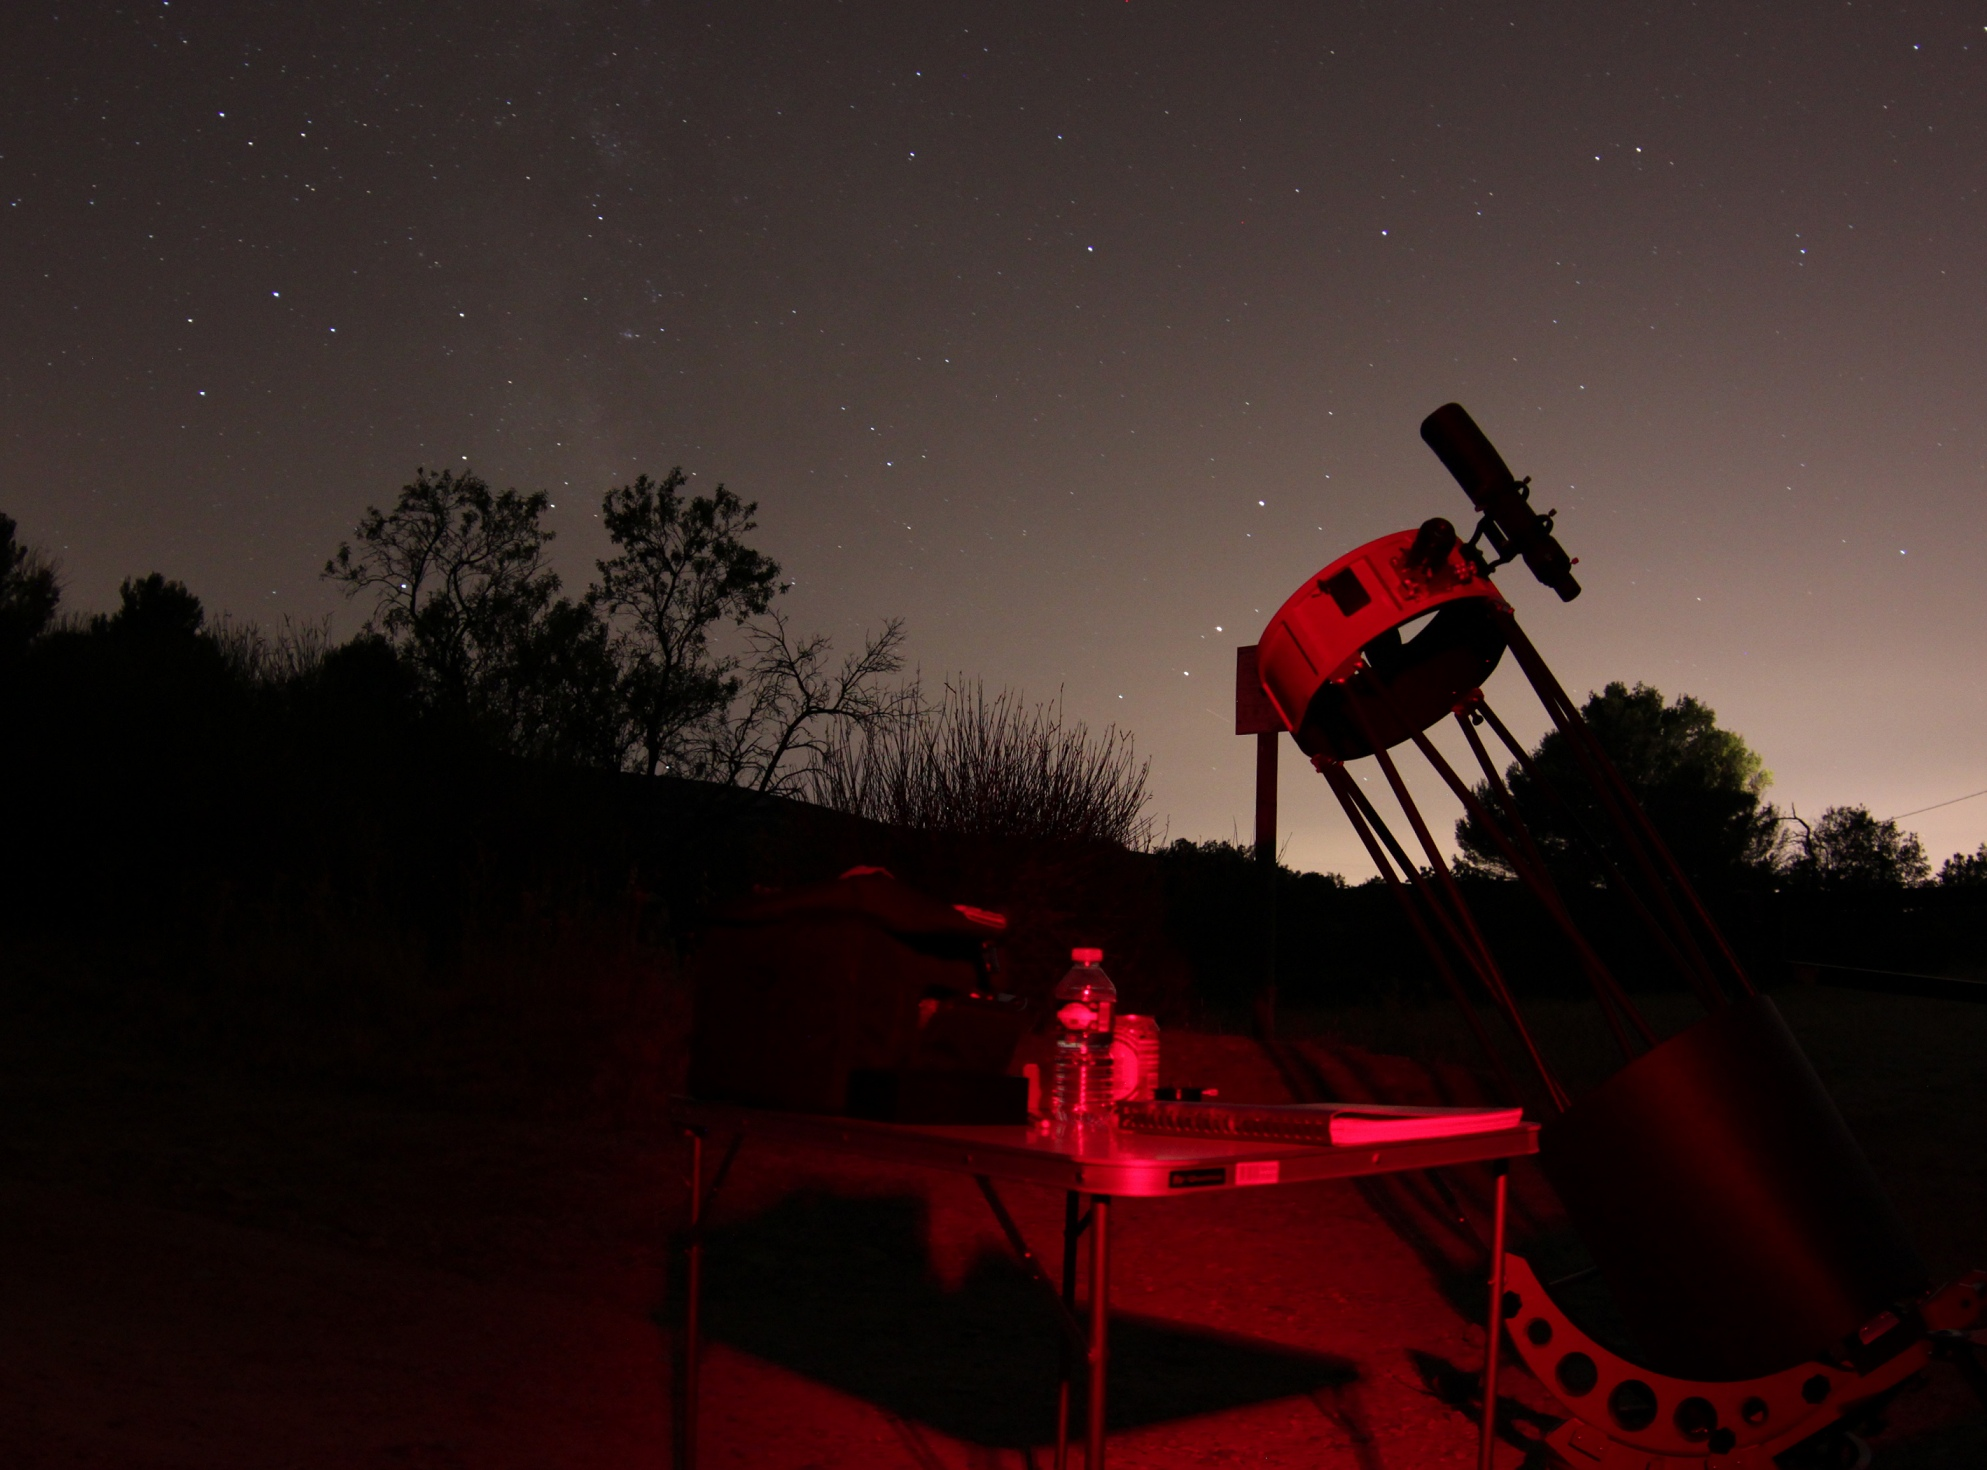 http://ekladata.com/J_bCVZ81vkUbMM5PPOC06k3zgfk/Pichauris-23-08-2016-telescope-low.jpg